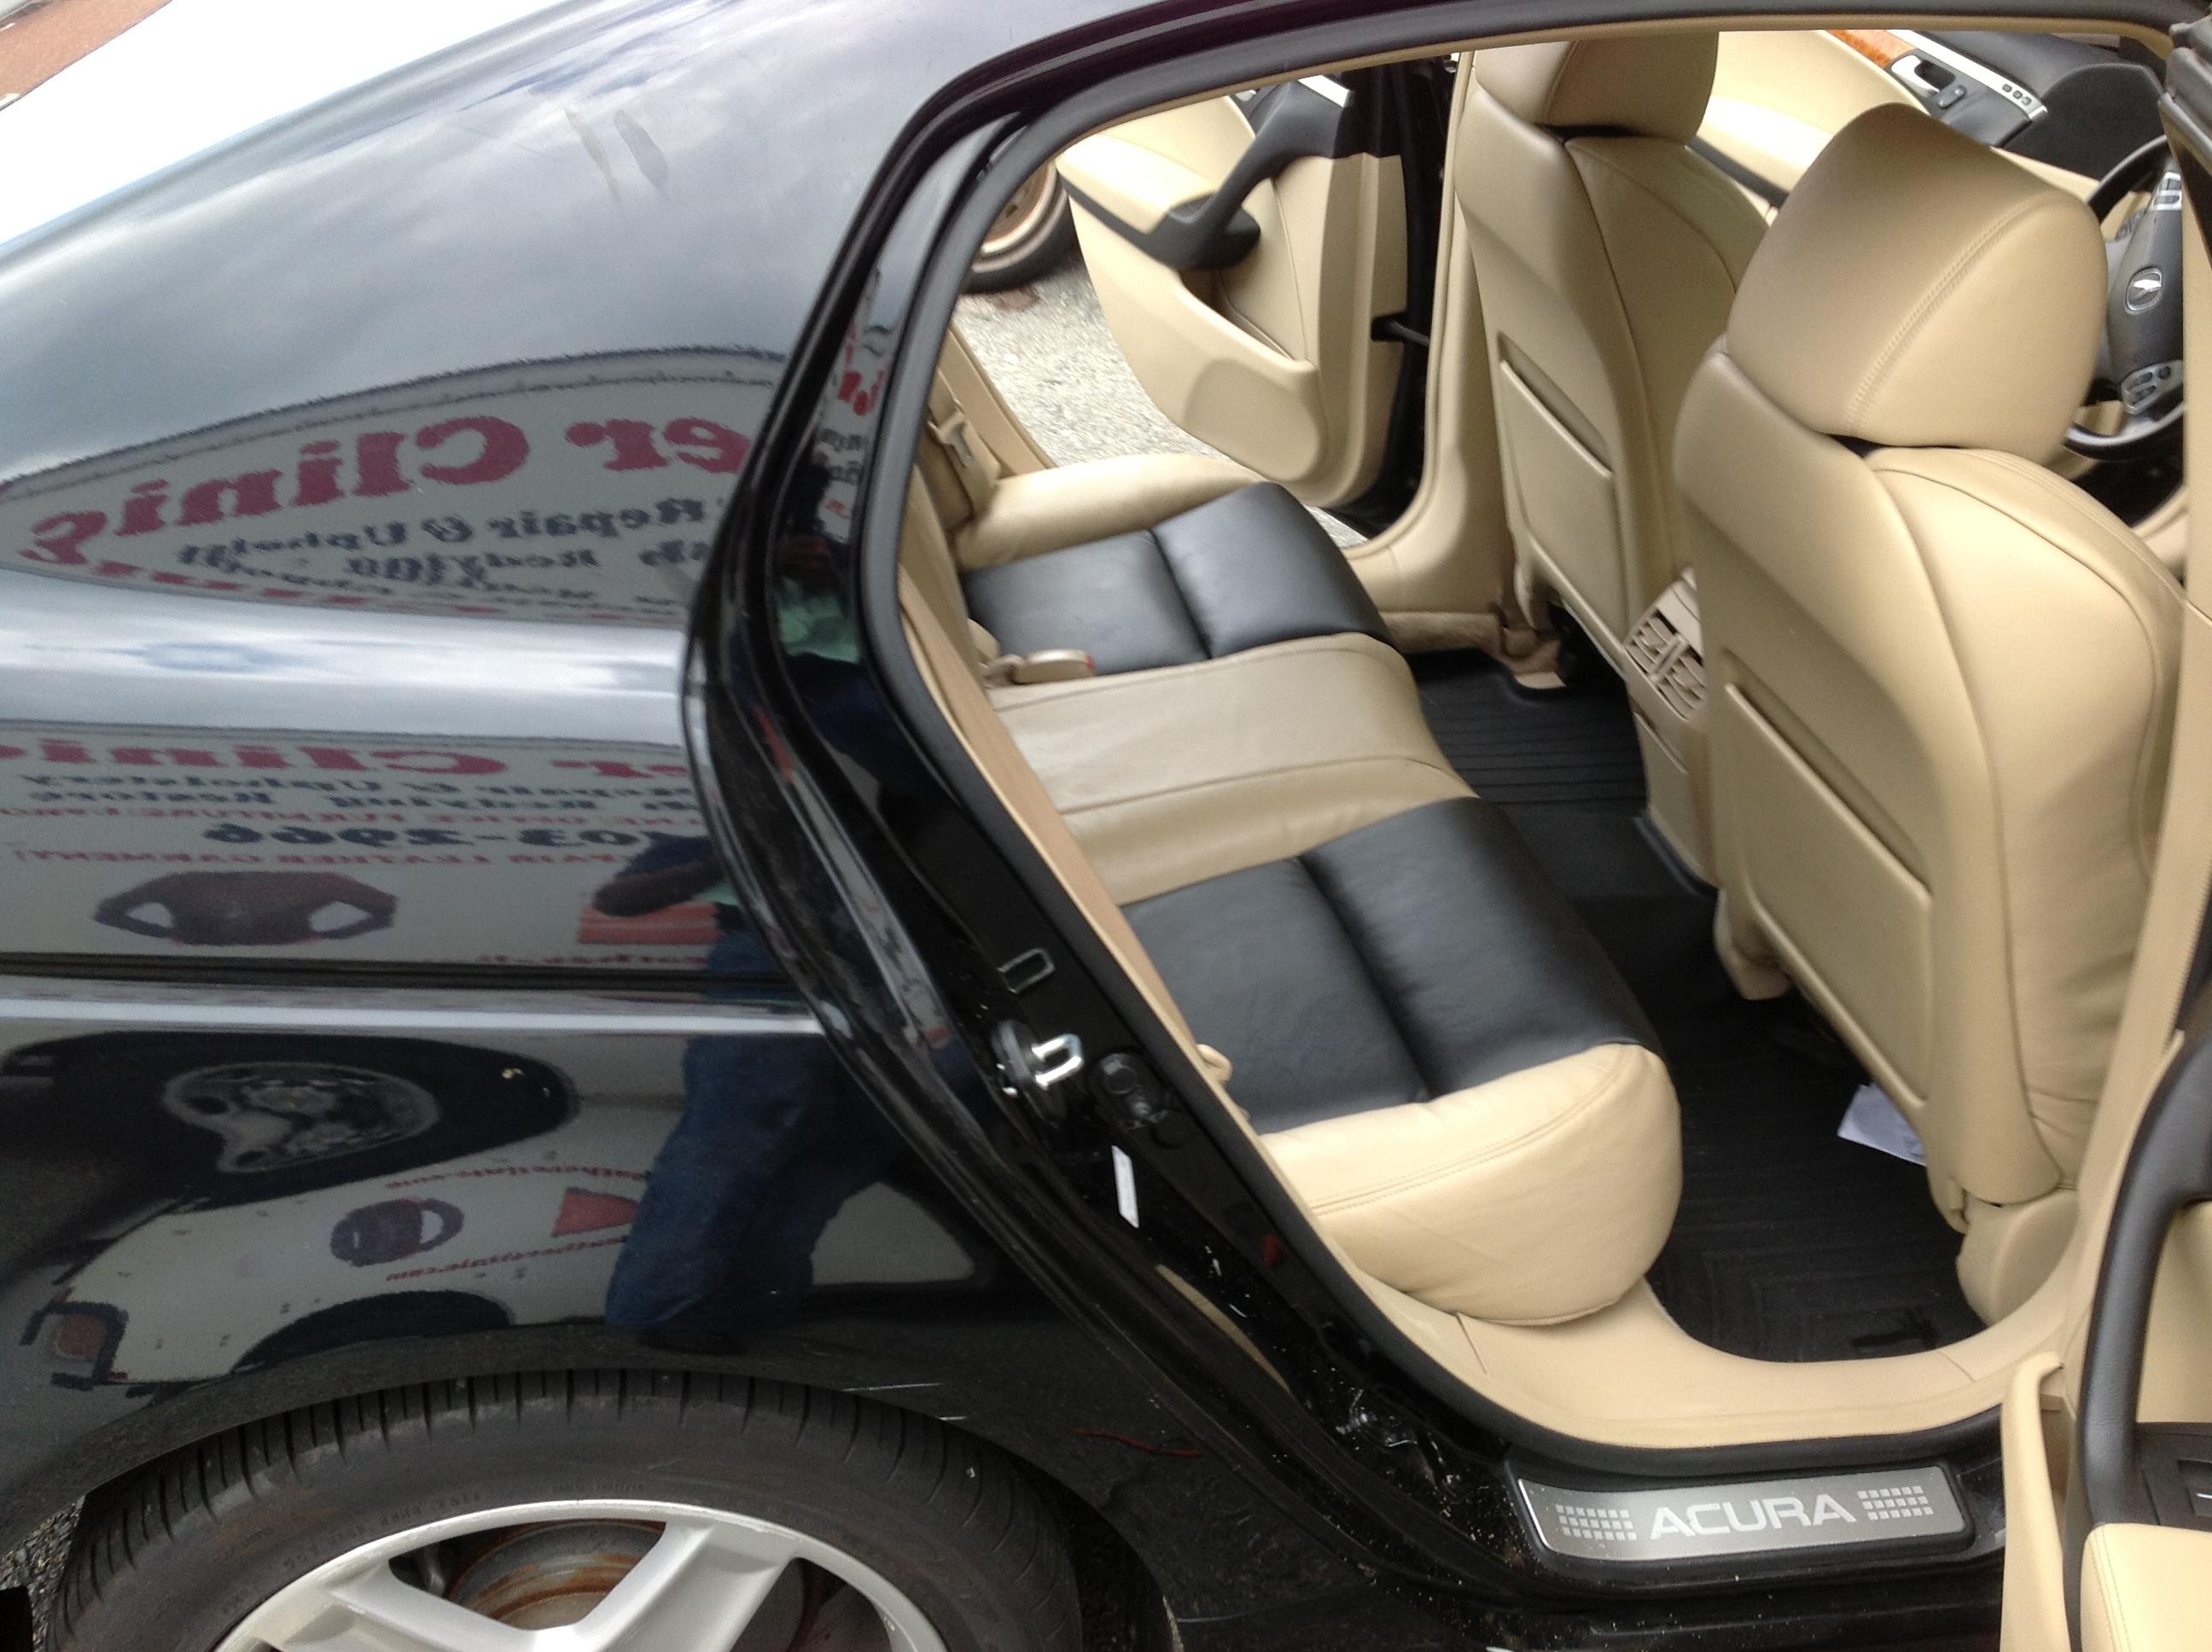 Acura rear seat